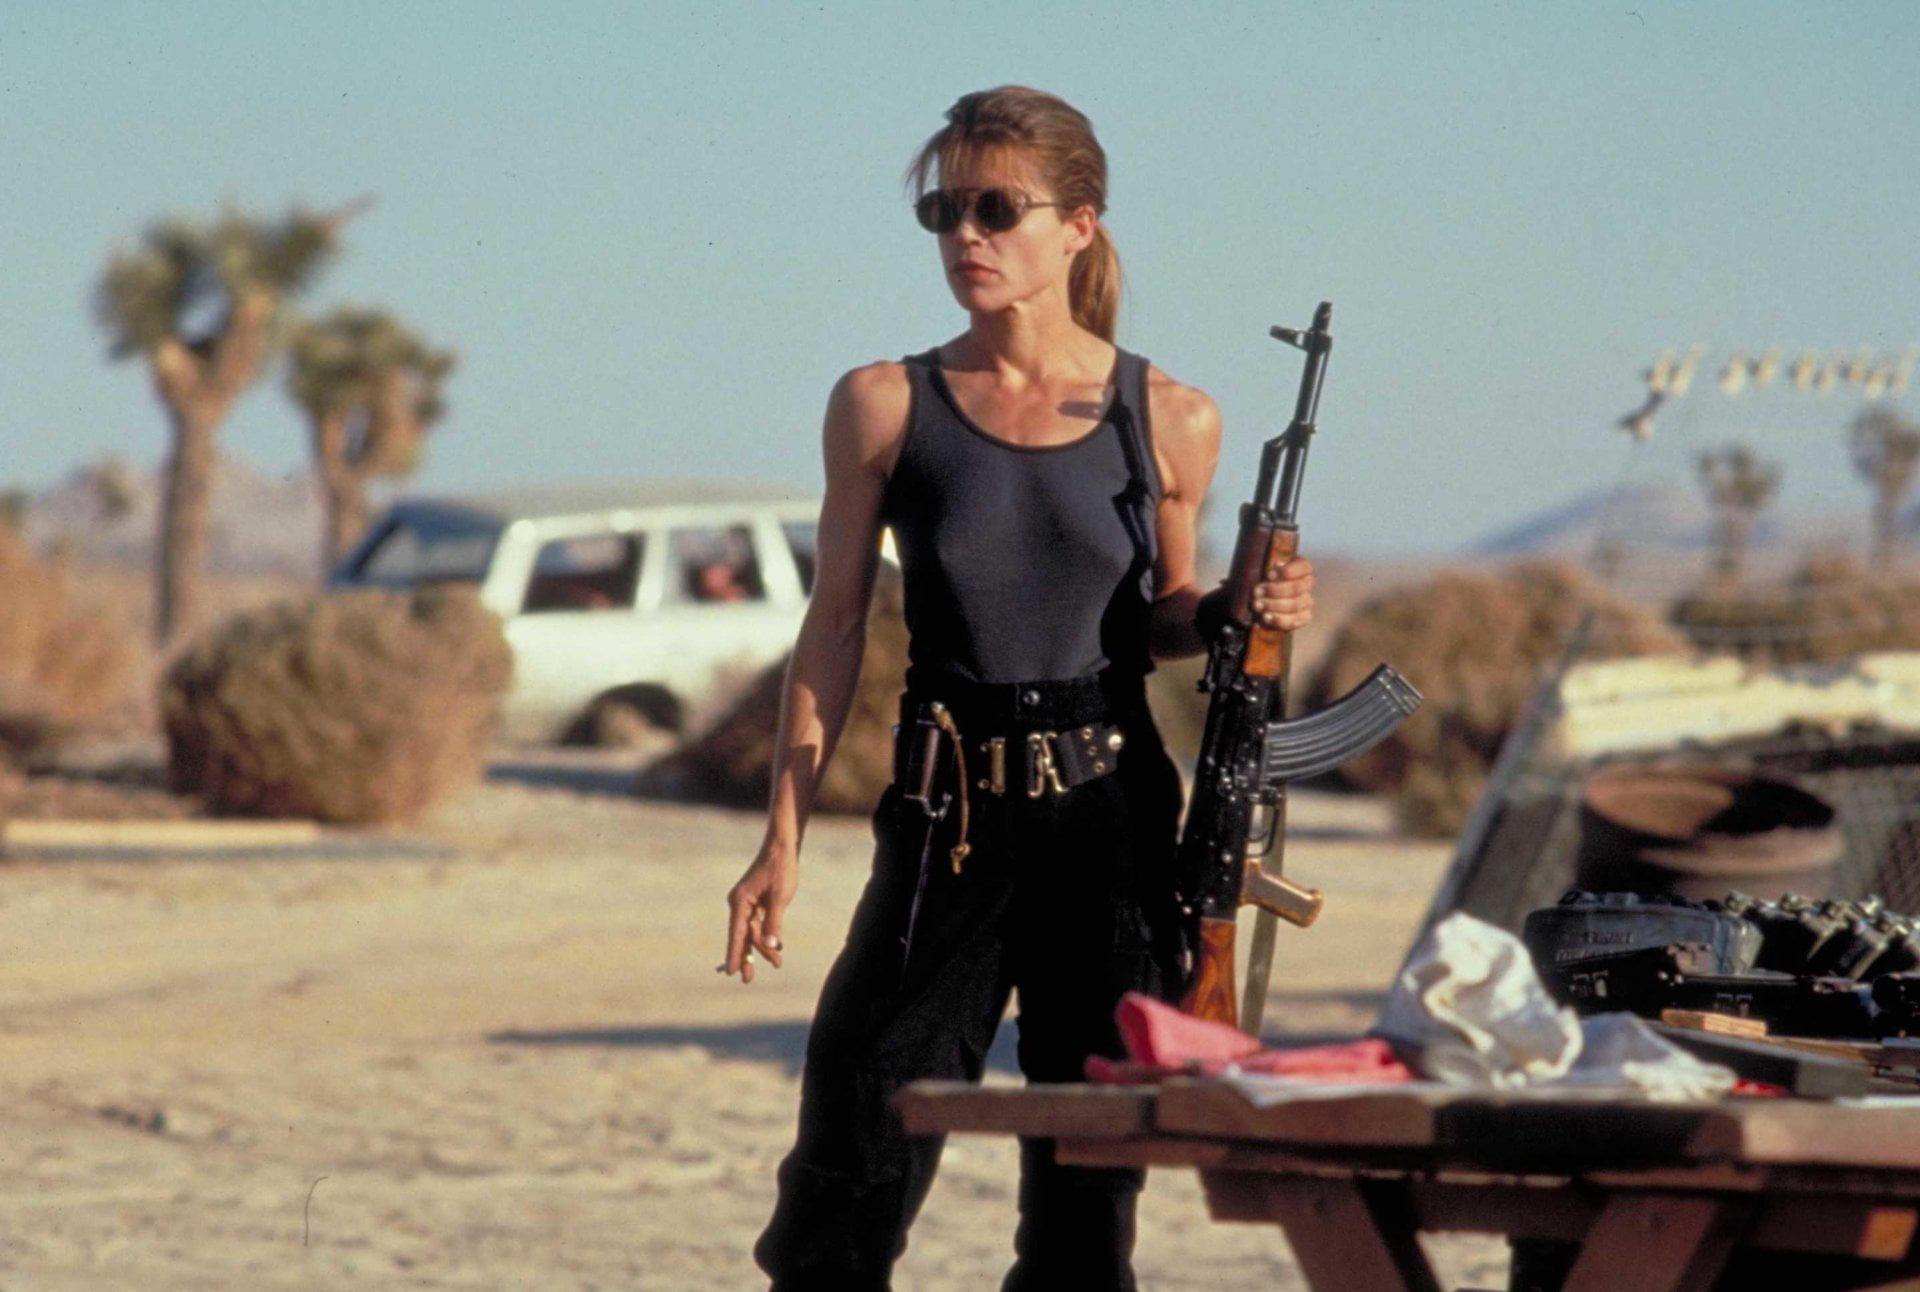 Women S Black Tank Top Terminator Terminator 2 Judgment Day Linda Hamilton Sarah Connor 1080p Wallpa Linda Hamilton Terminator Terminator Terminator Movies